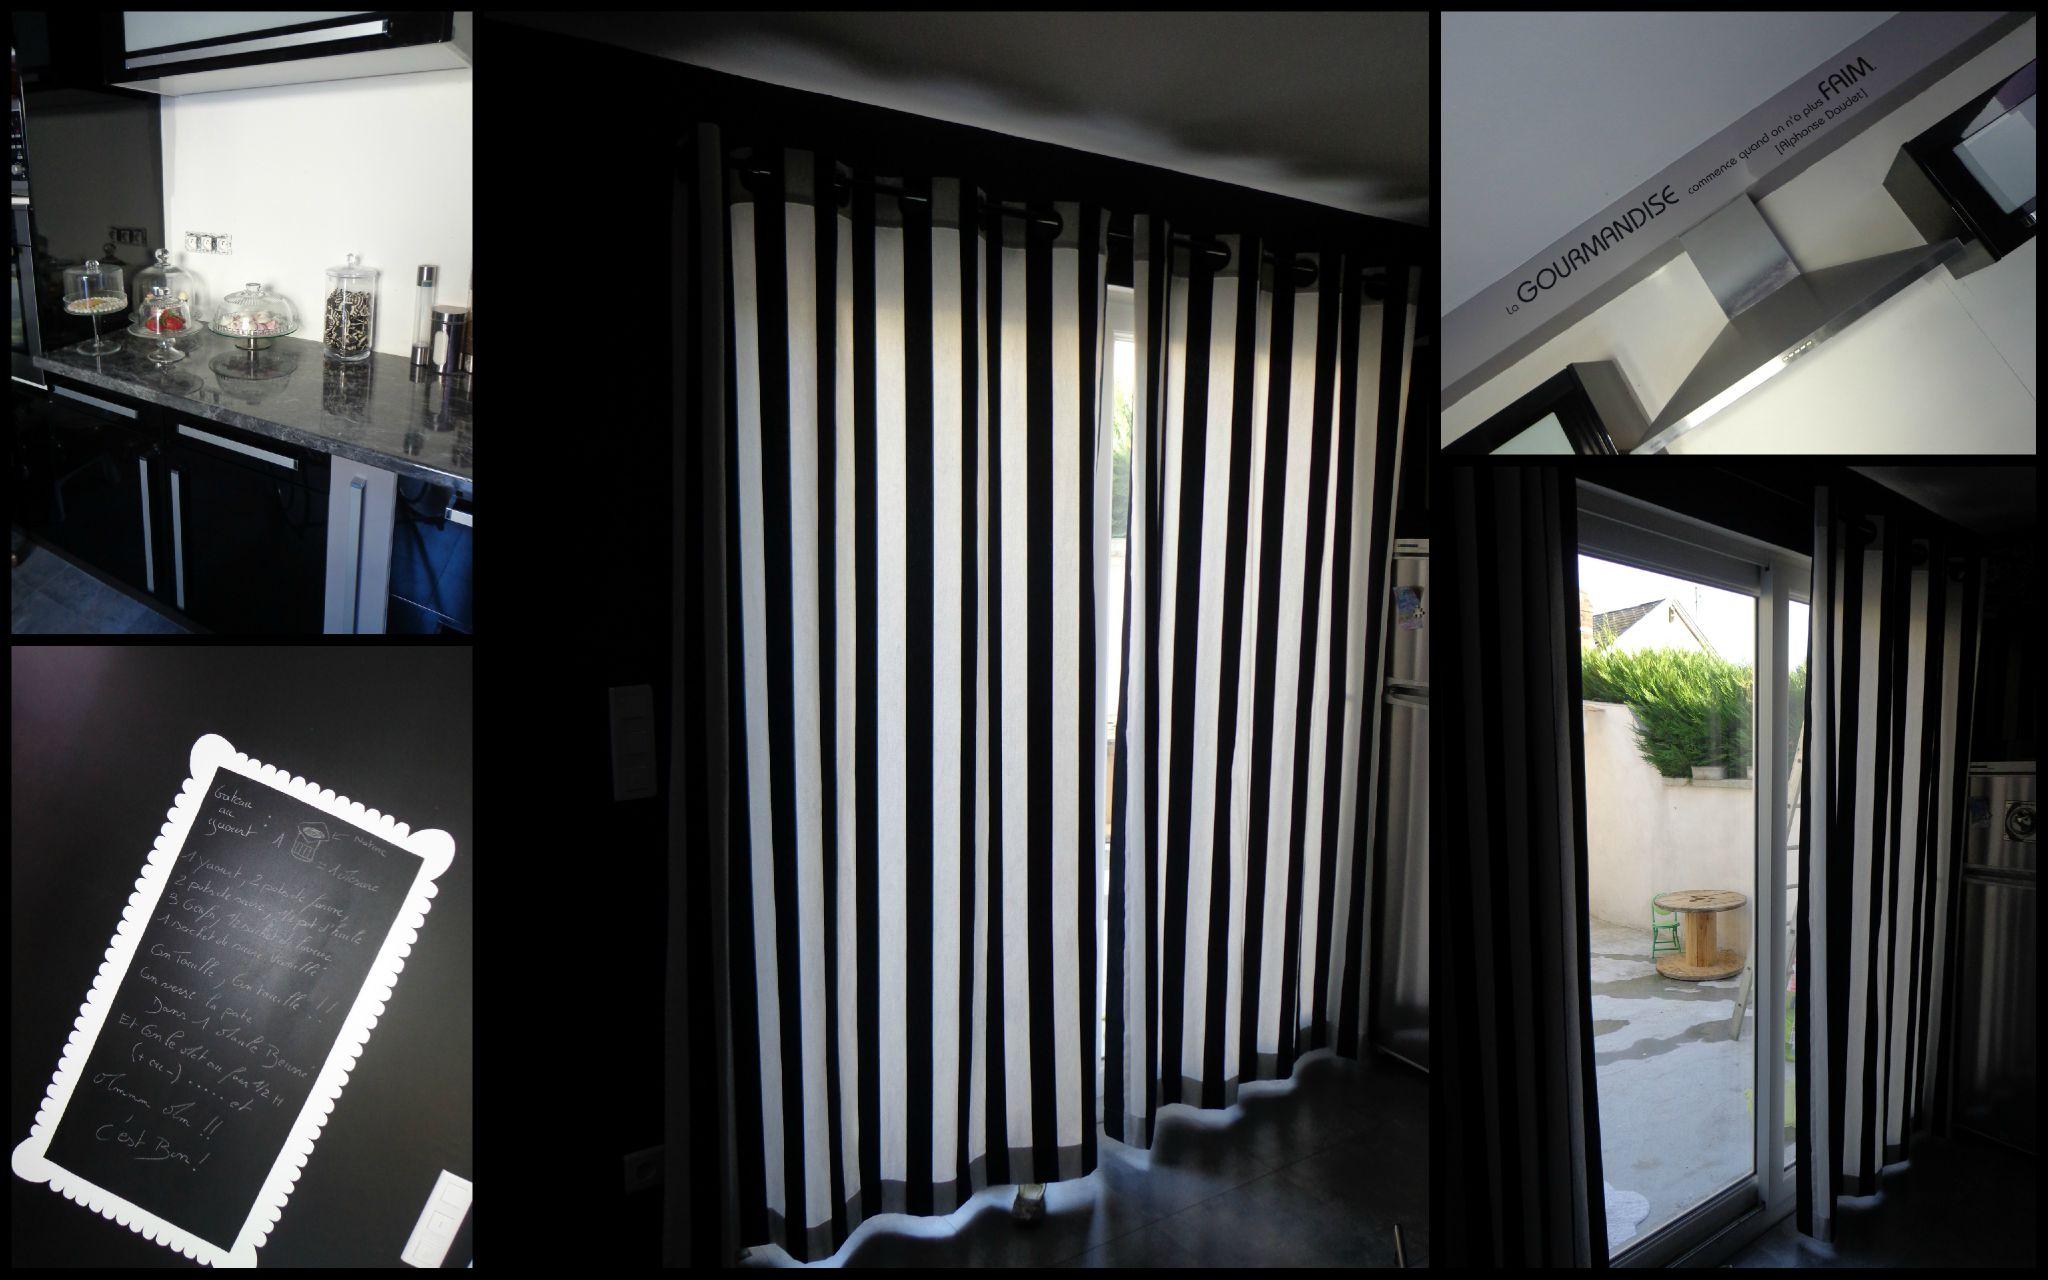 Rideau Noir | Rideau Occultant 140 X 240 Cm Lourd Solide A Oeillets ...